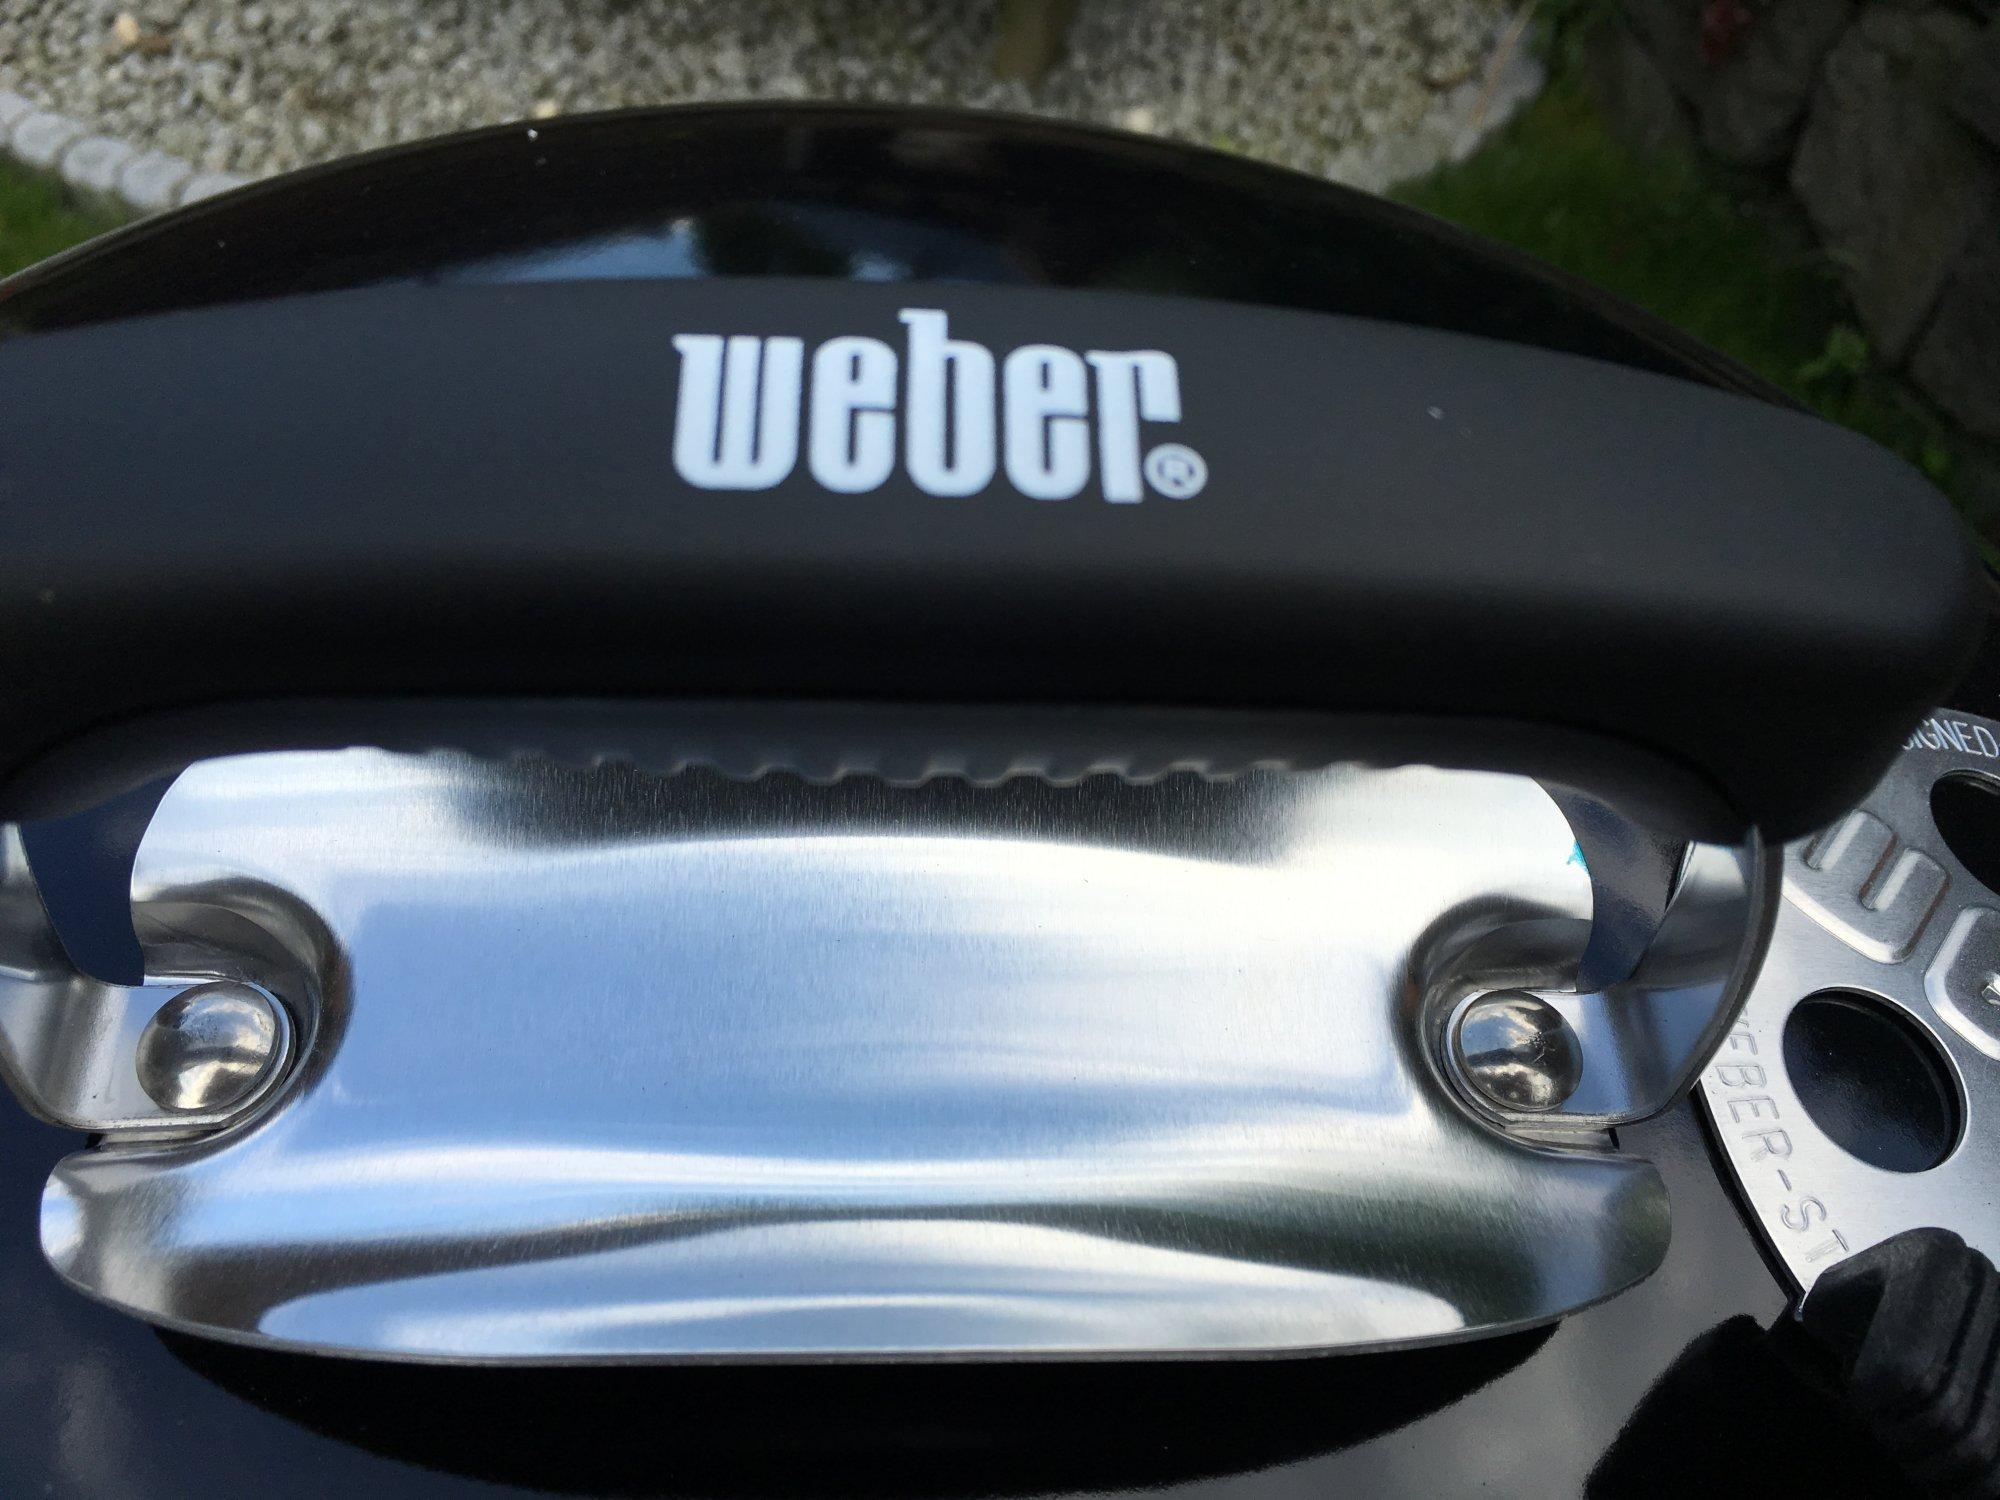 Weber Grill Holzkohlegrill Performer Deluxe Gbs Gourmet : Erledigt weber performer deluxe gbs gourmet holzkohlegrill